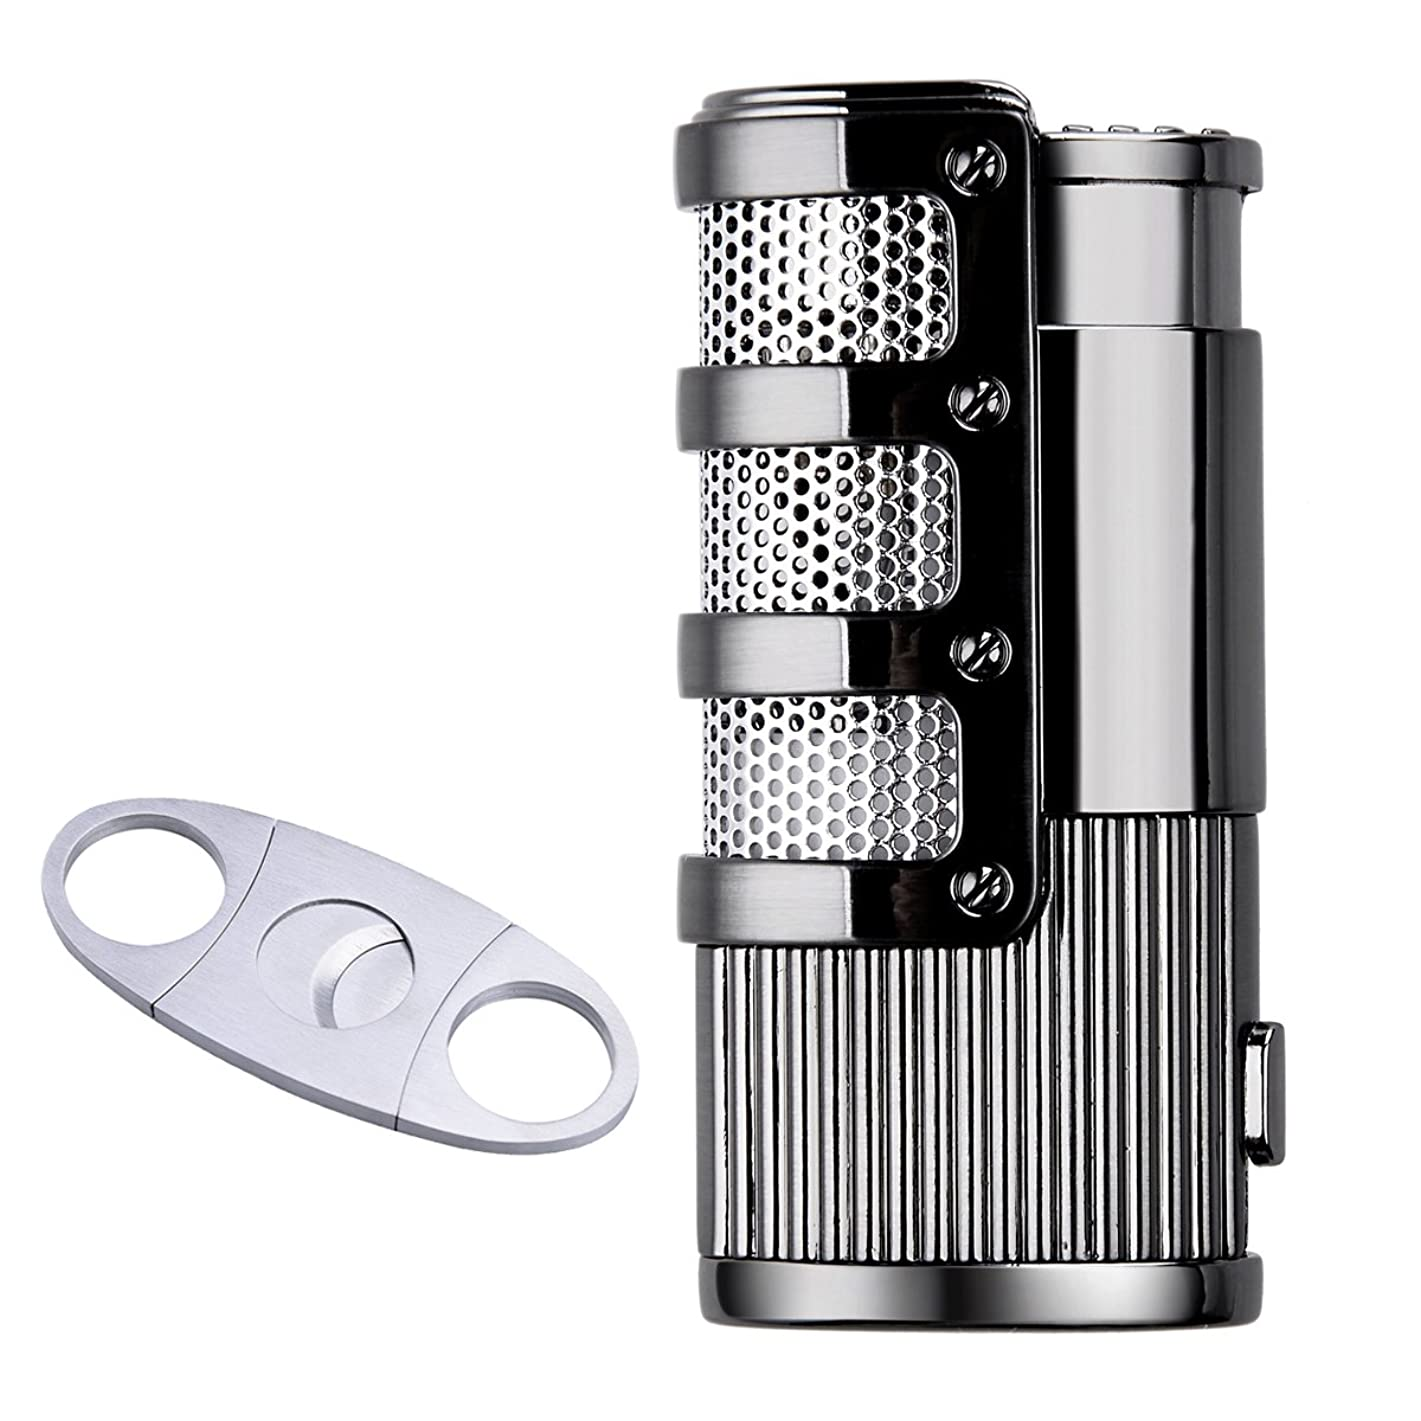 Gift Set Triple Jet Flame Cigarette Cigar Torch Lighter with Cigar Scissors, Silver+Black